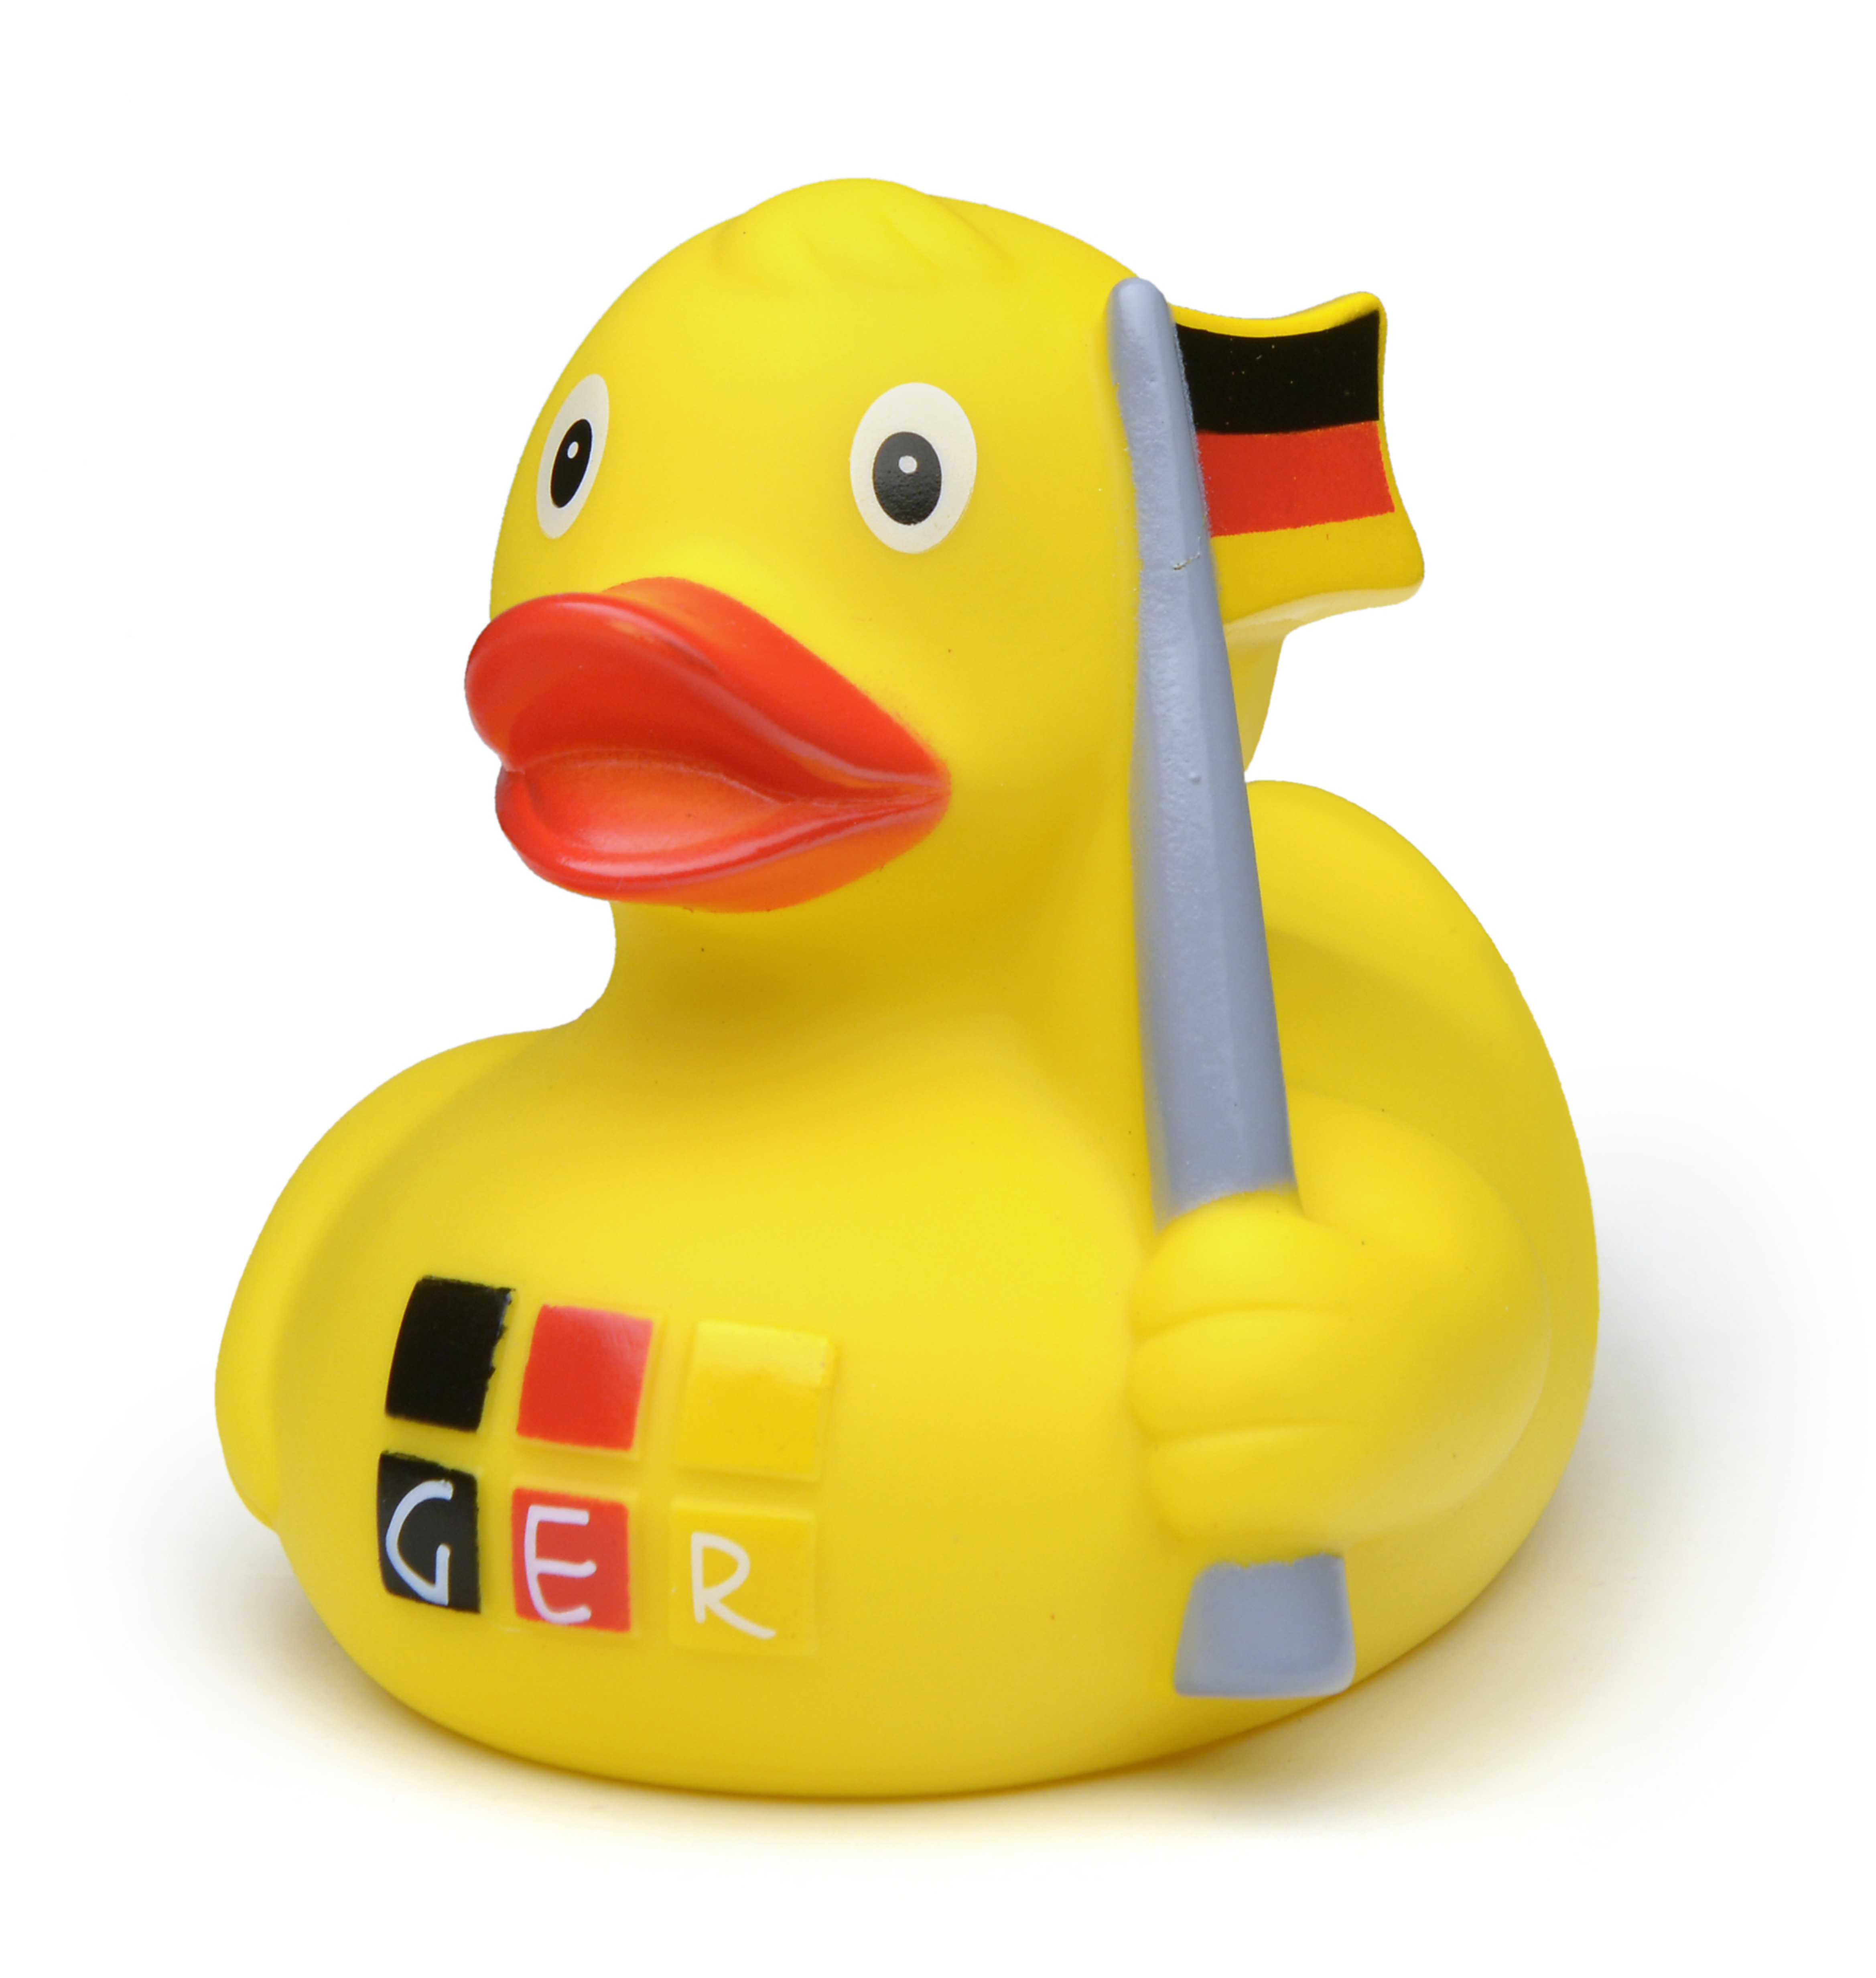 Gummi-Ente Germany mit Fahne